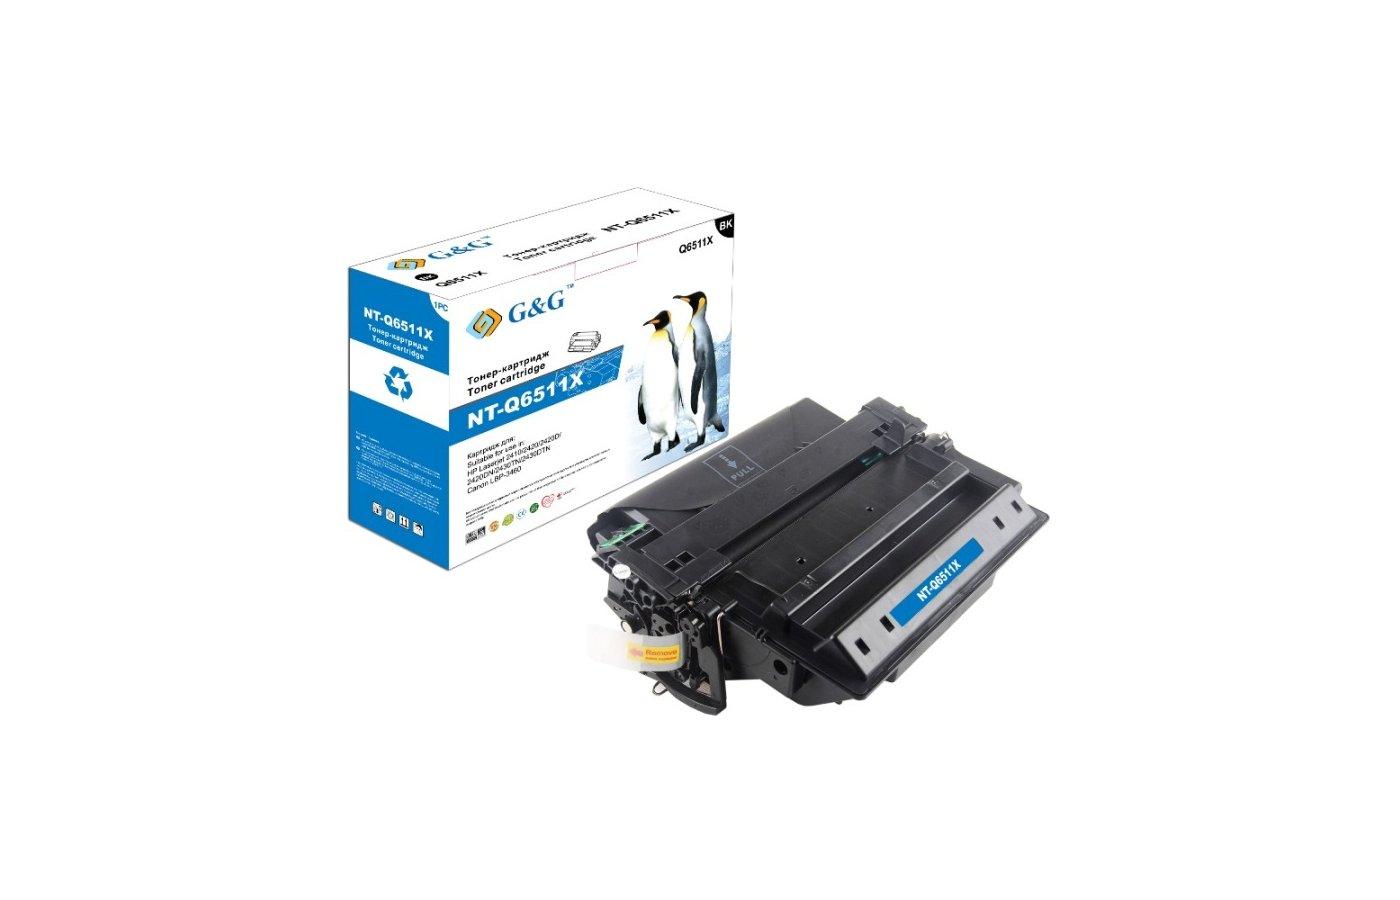 Картридж лазерный GG NT-Q6511X Совместимый для HP LaserJet 2410/2420/2430 Canon LBP-3460 (12000стр)